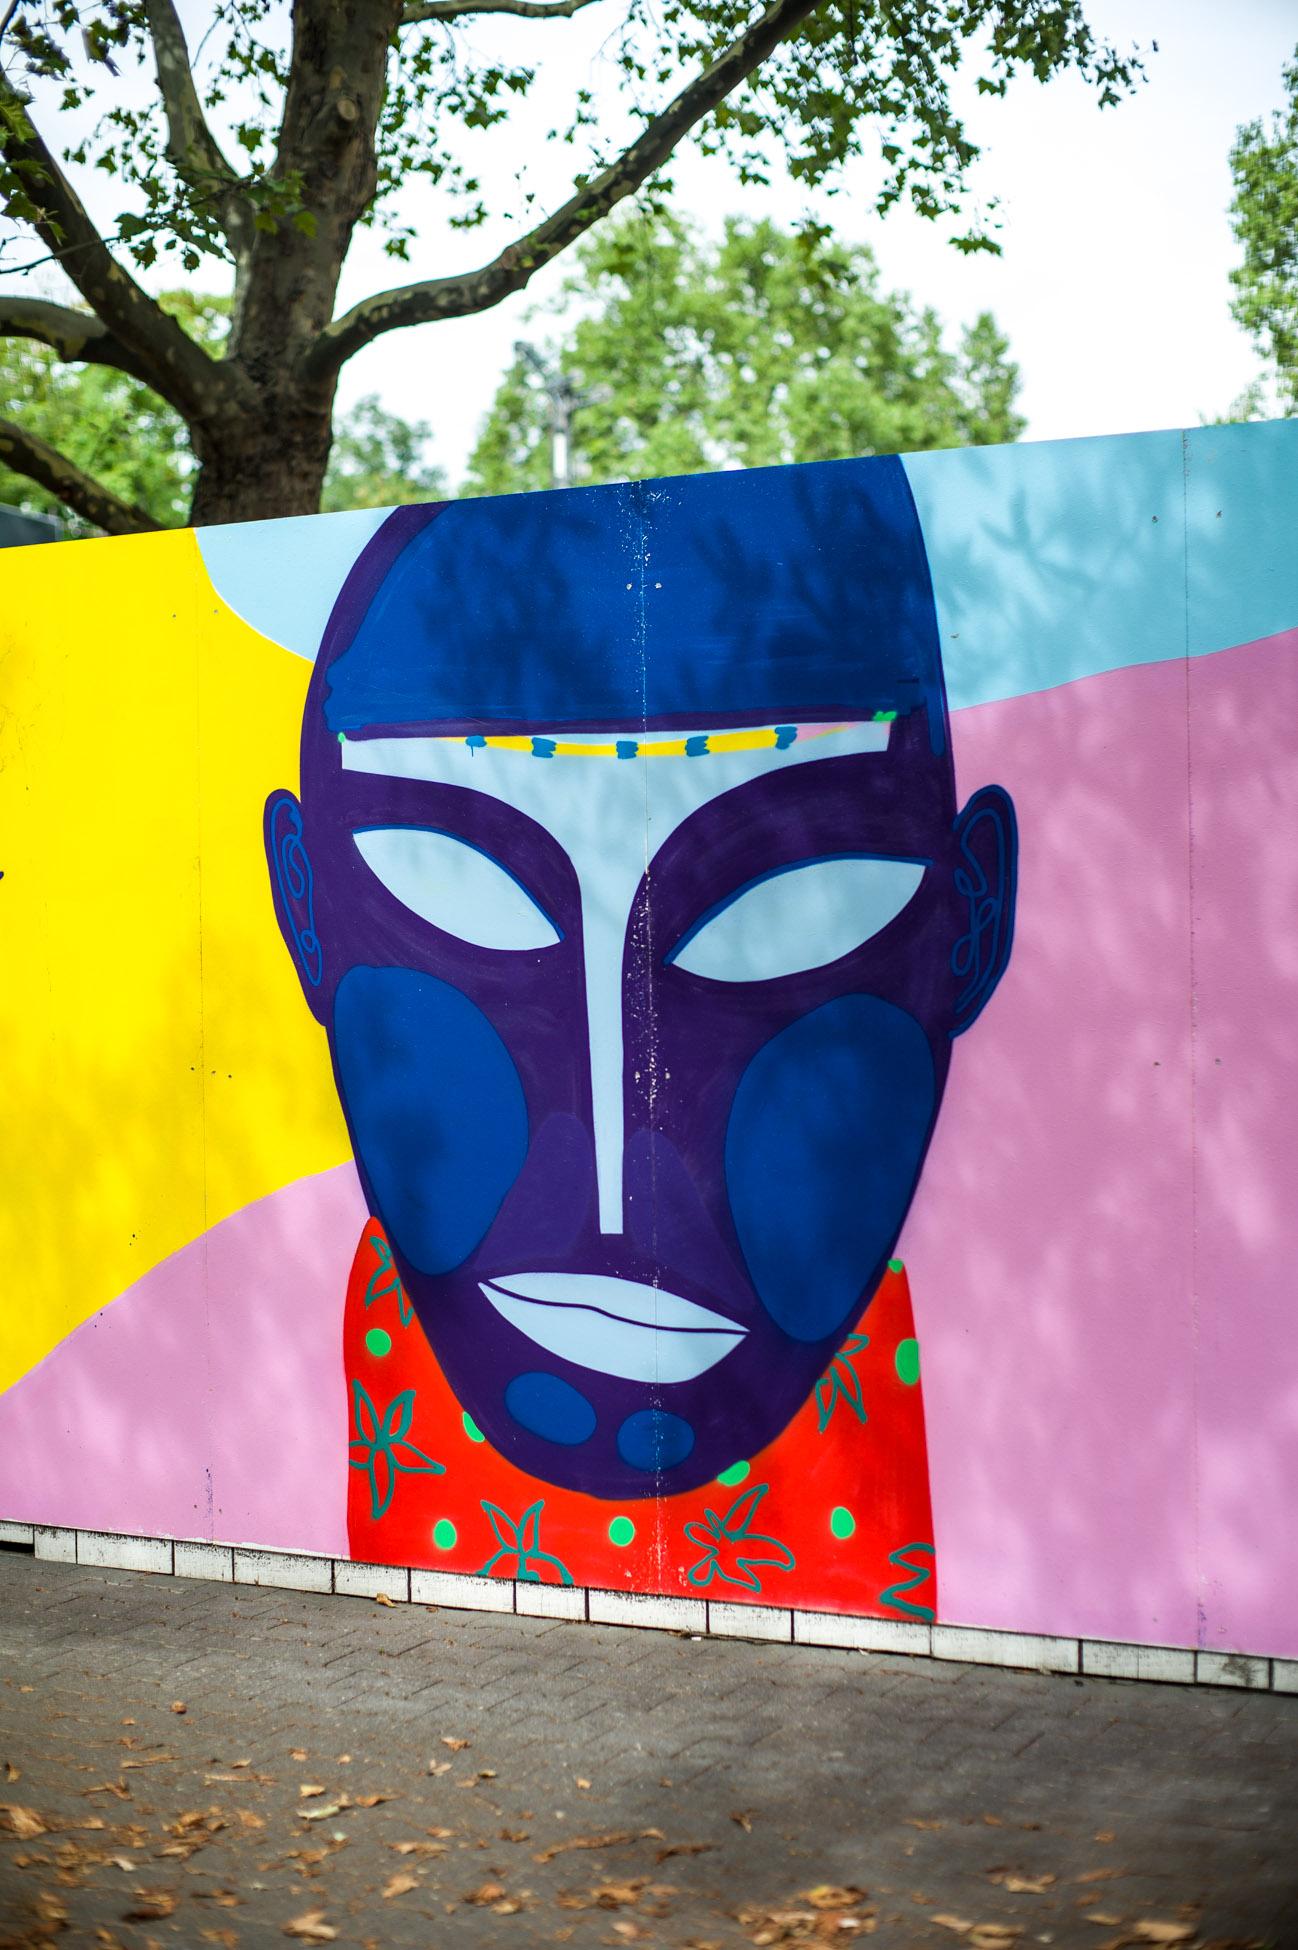 Streetart_Brazil_Rimon guimaraes_2013_Frankfurt (2 von 15)